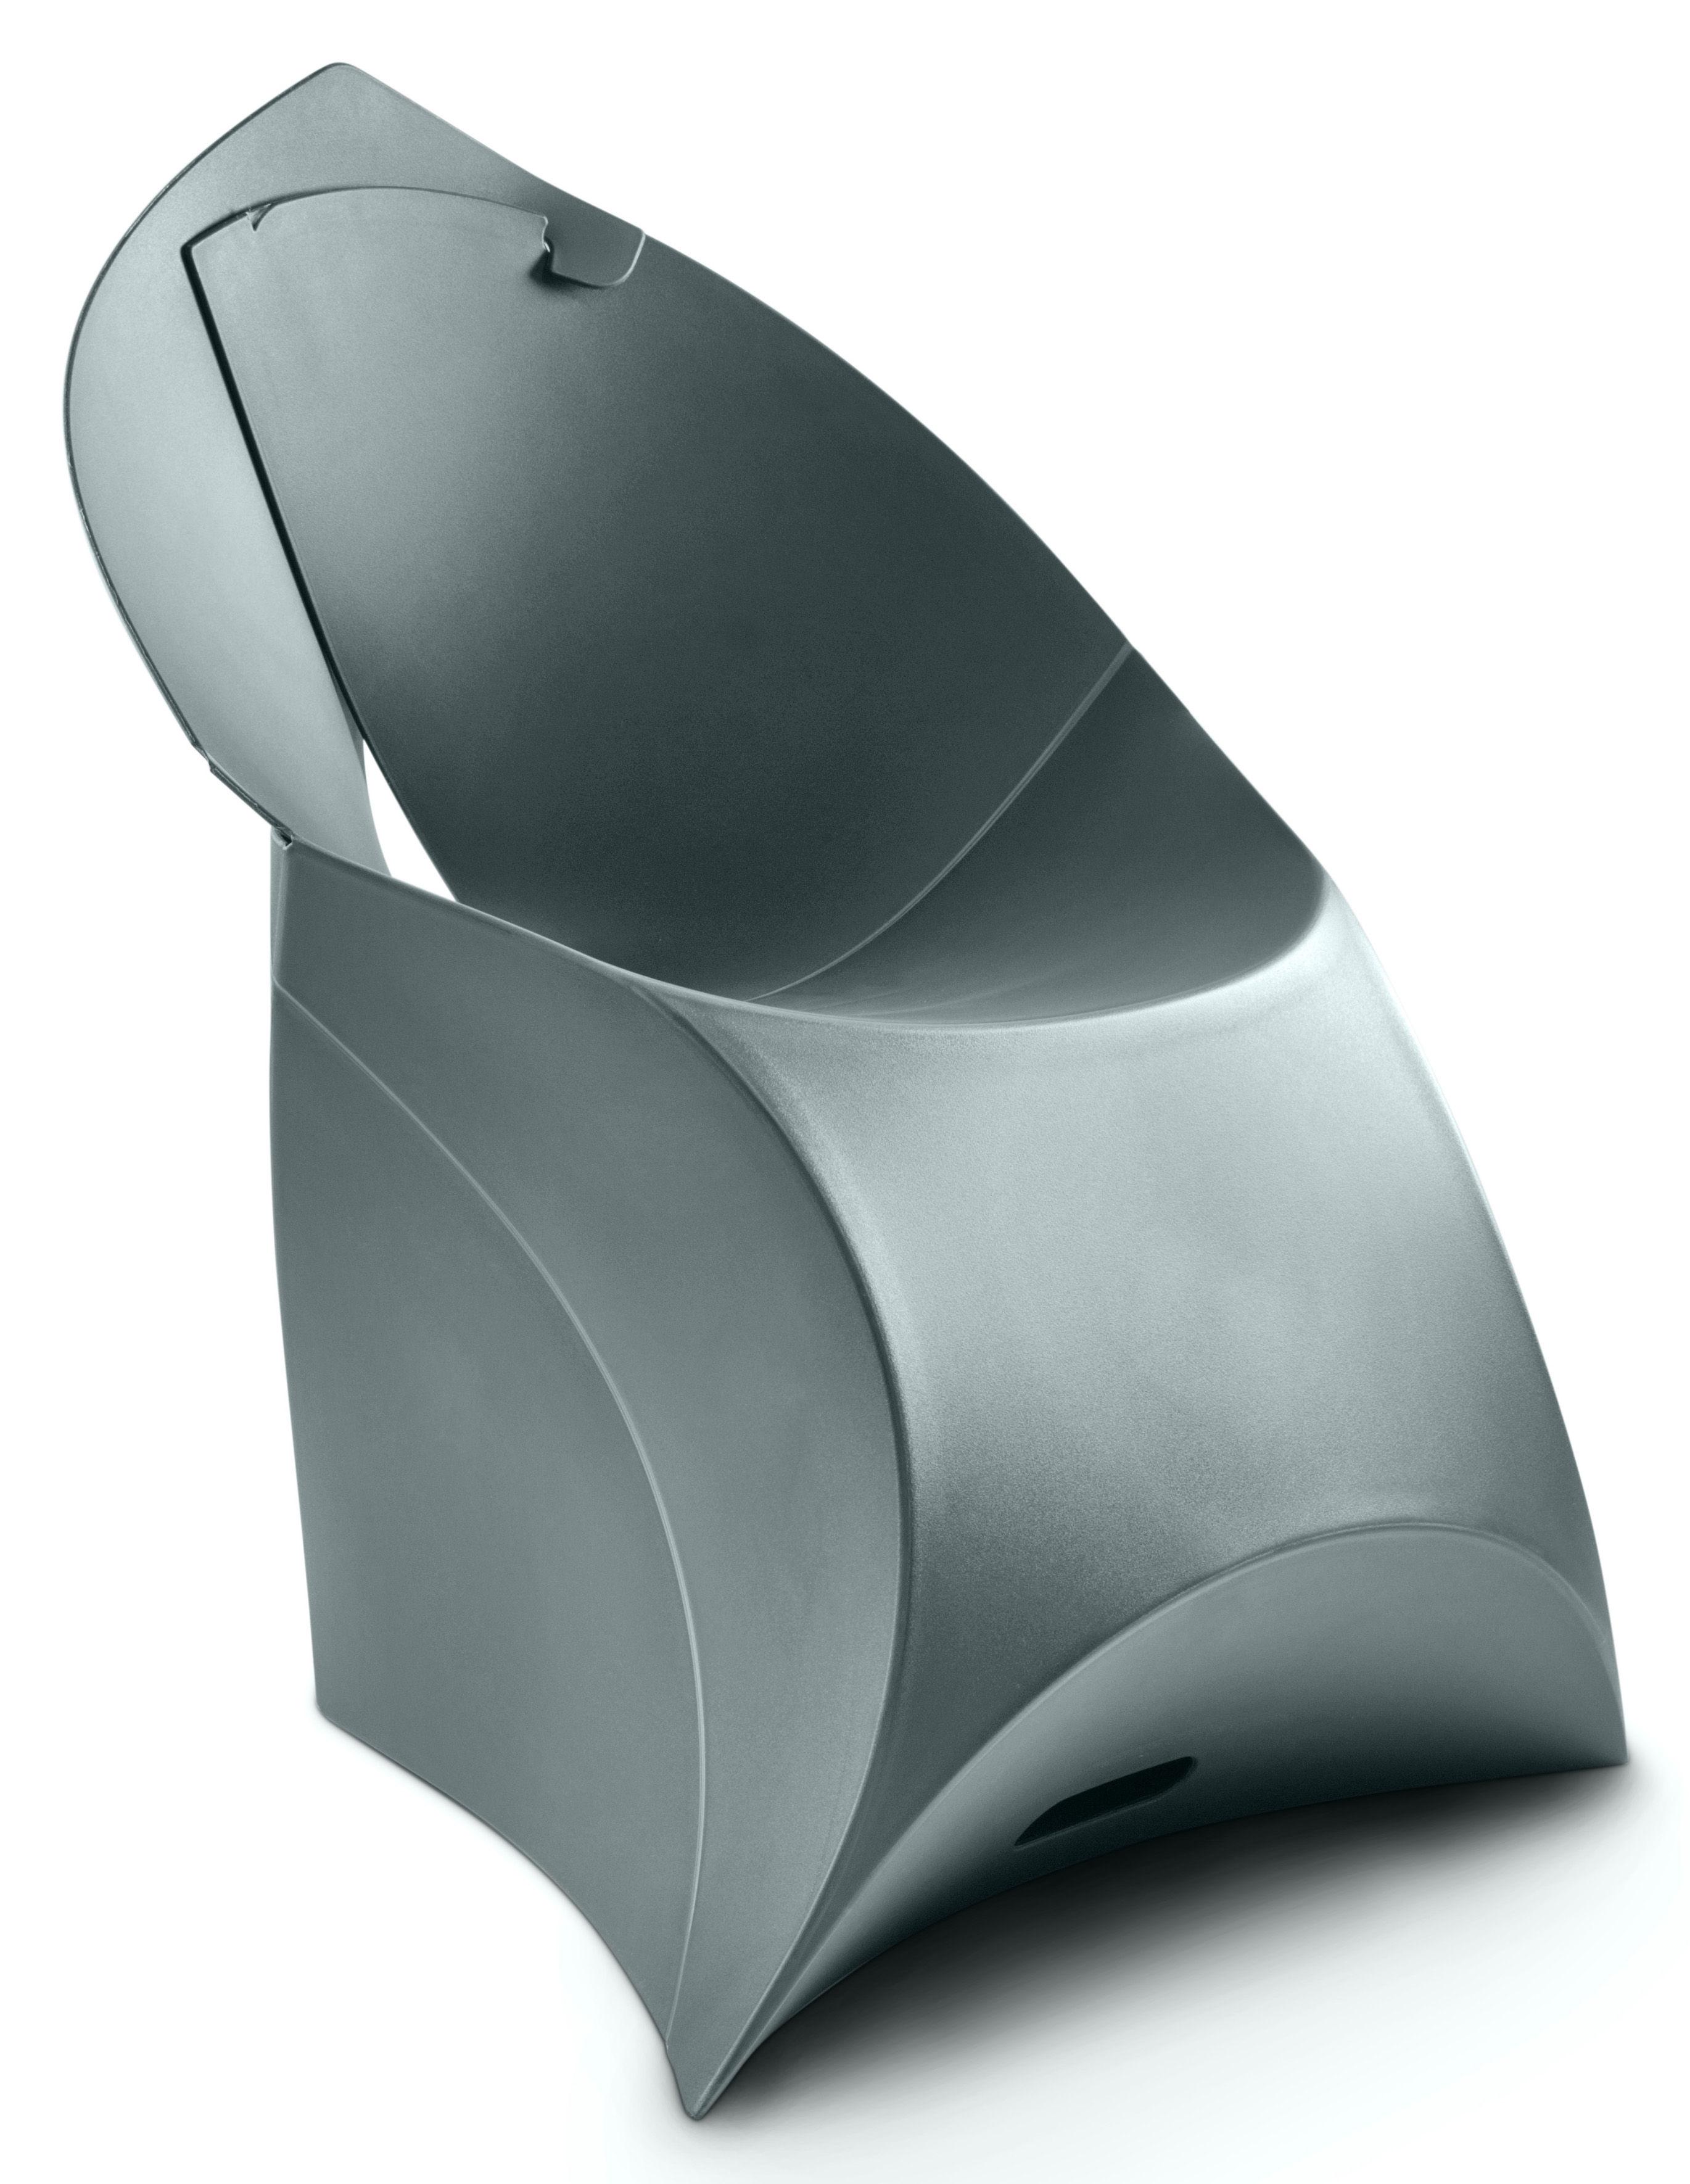 Furniture - Kids Furniture - Flux Chair Children armchair by Flux - Anthracite gray - Polypropylene